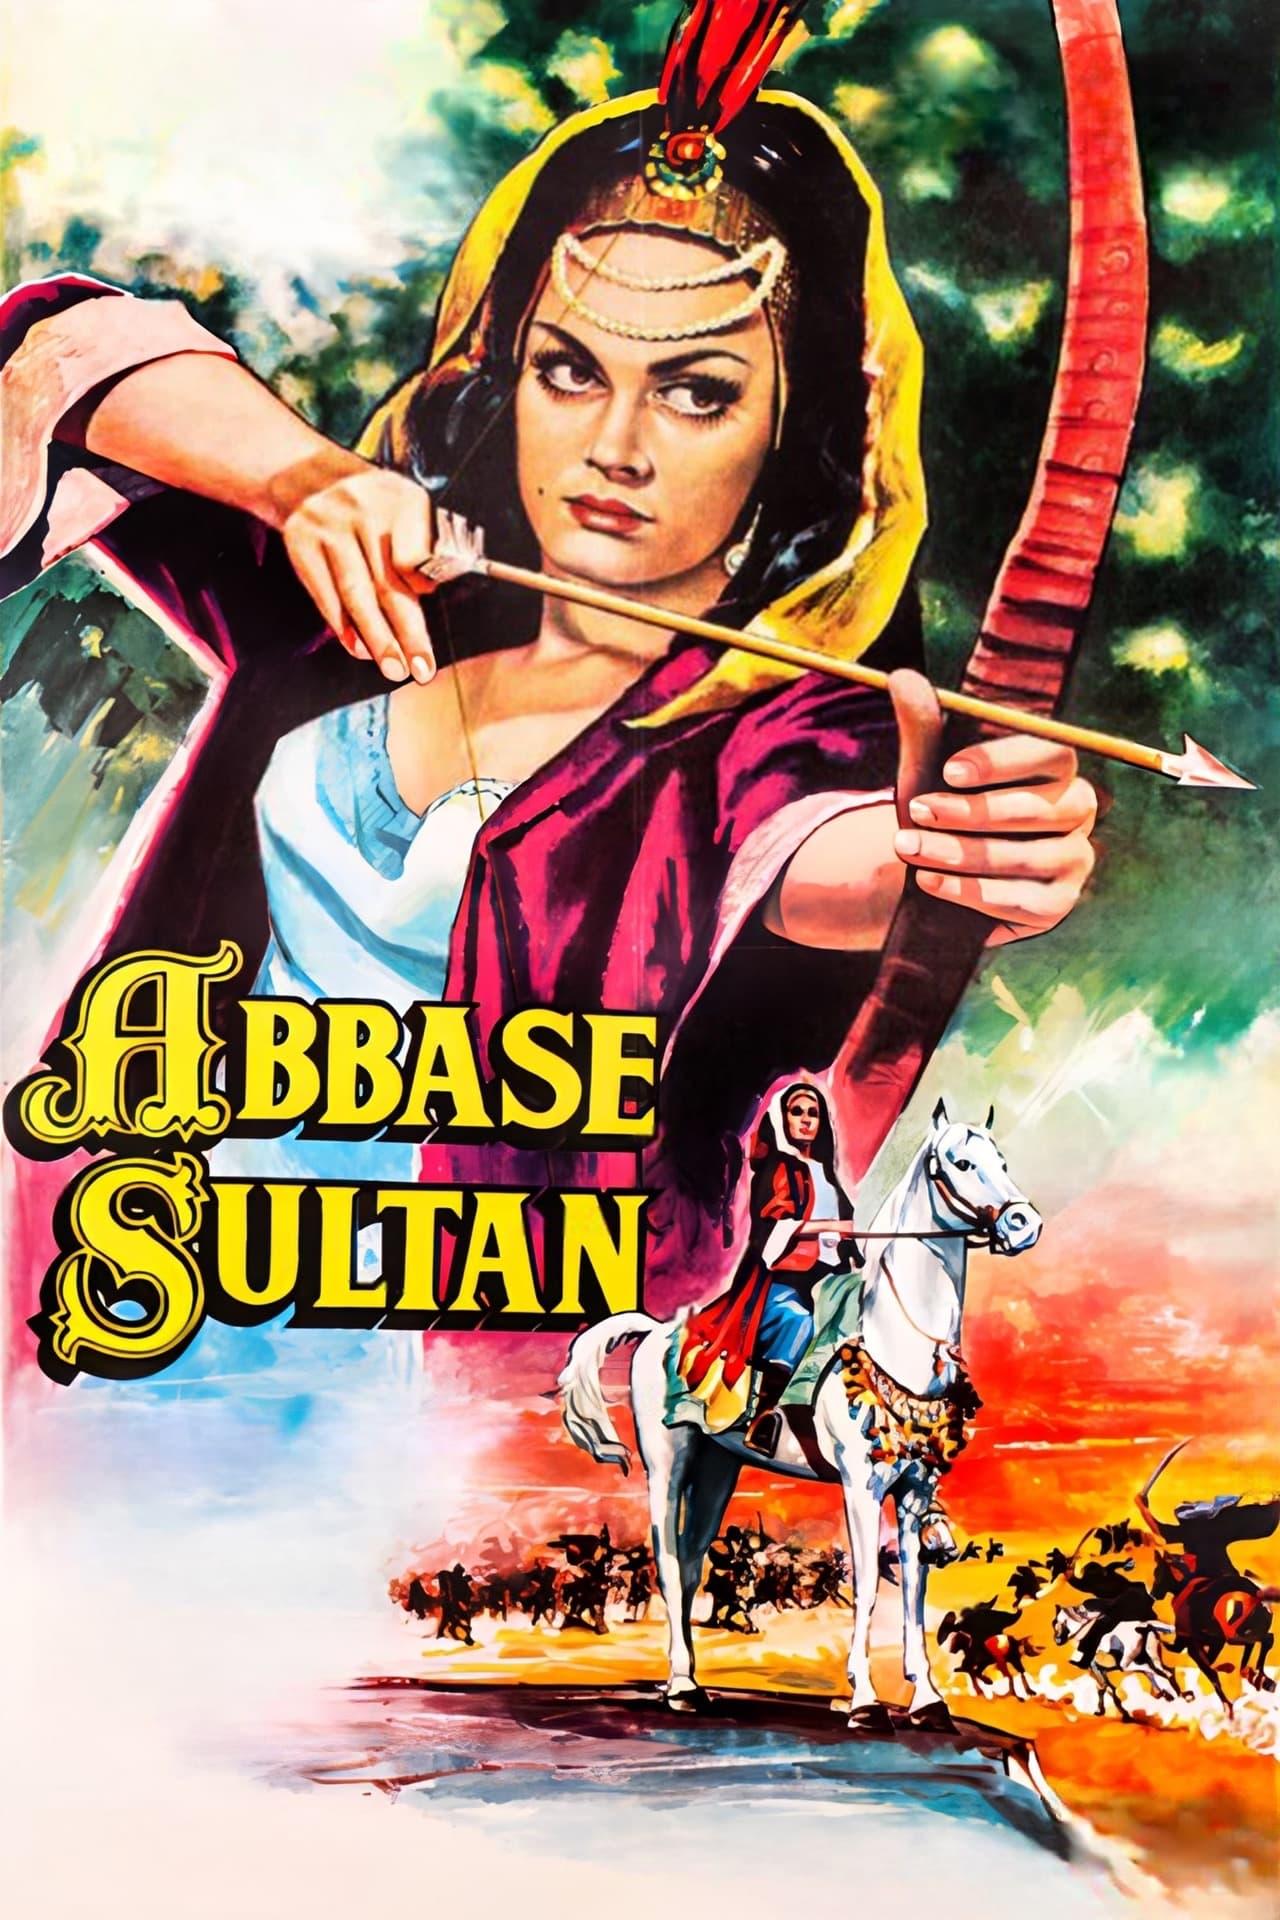 Abbase Sultan